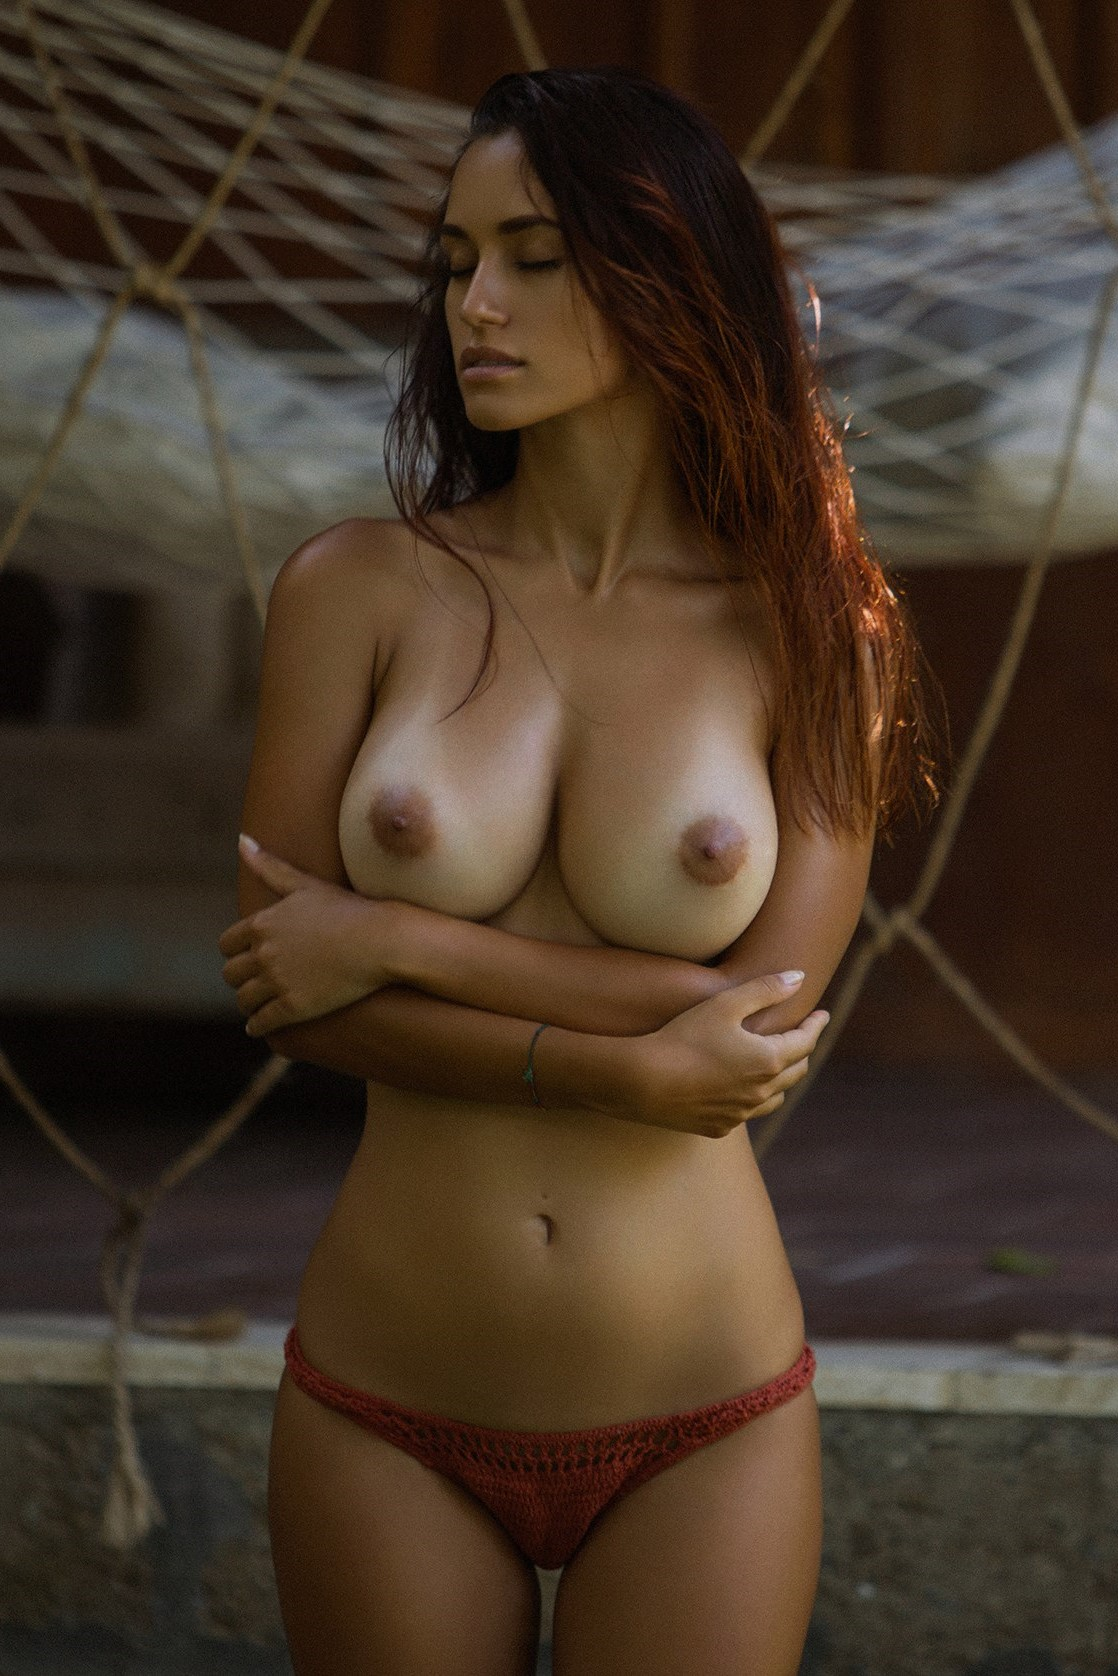 excellent boobs